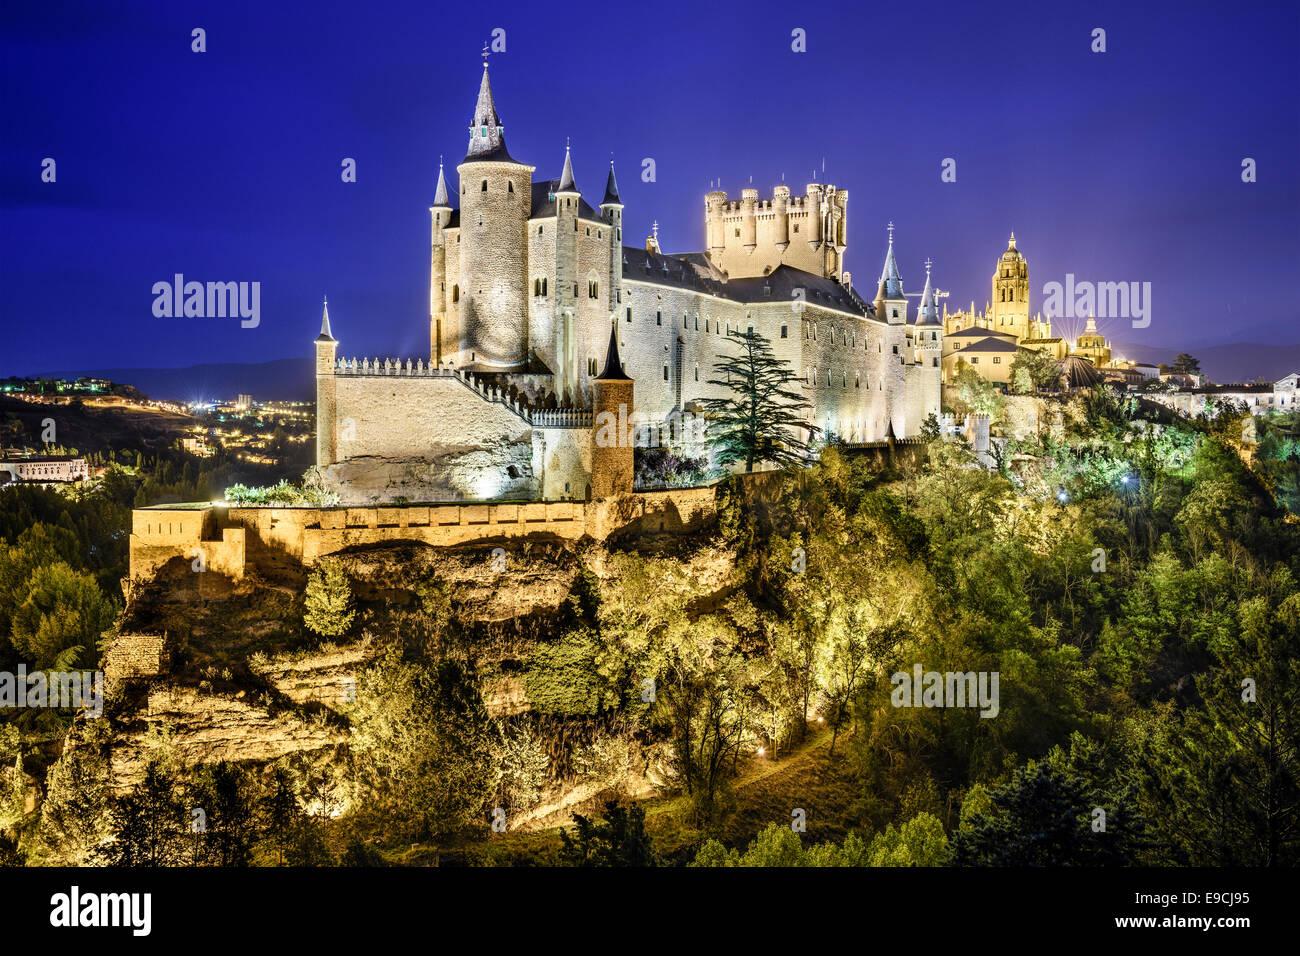 Segovia, Spain town skyline with the Alcazar at night. - Stock Image